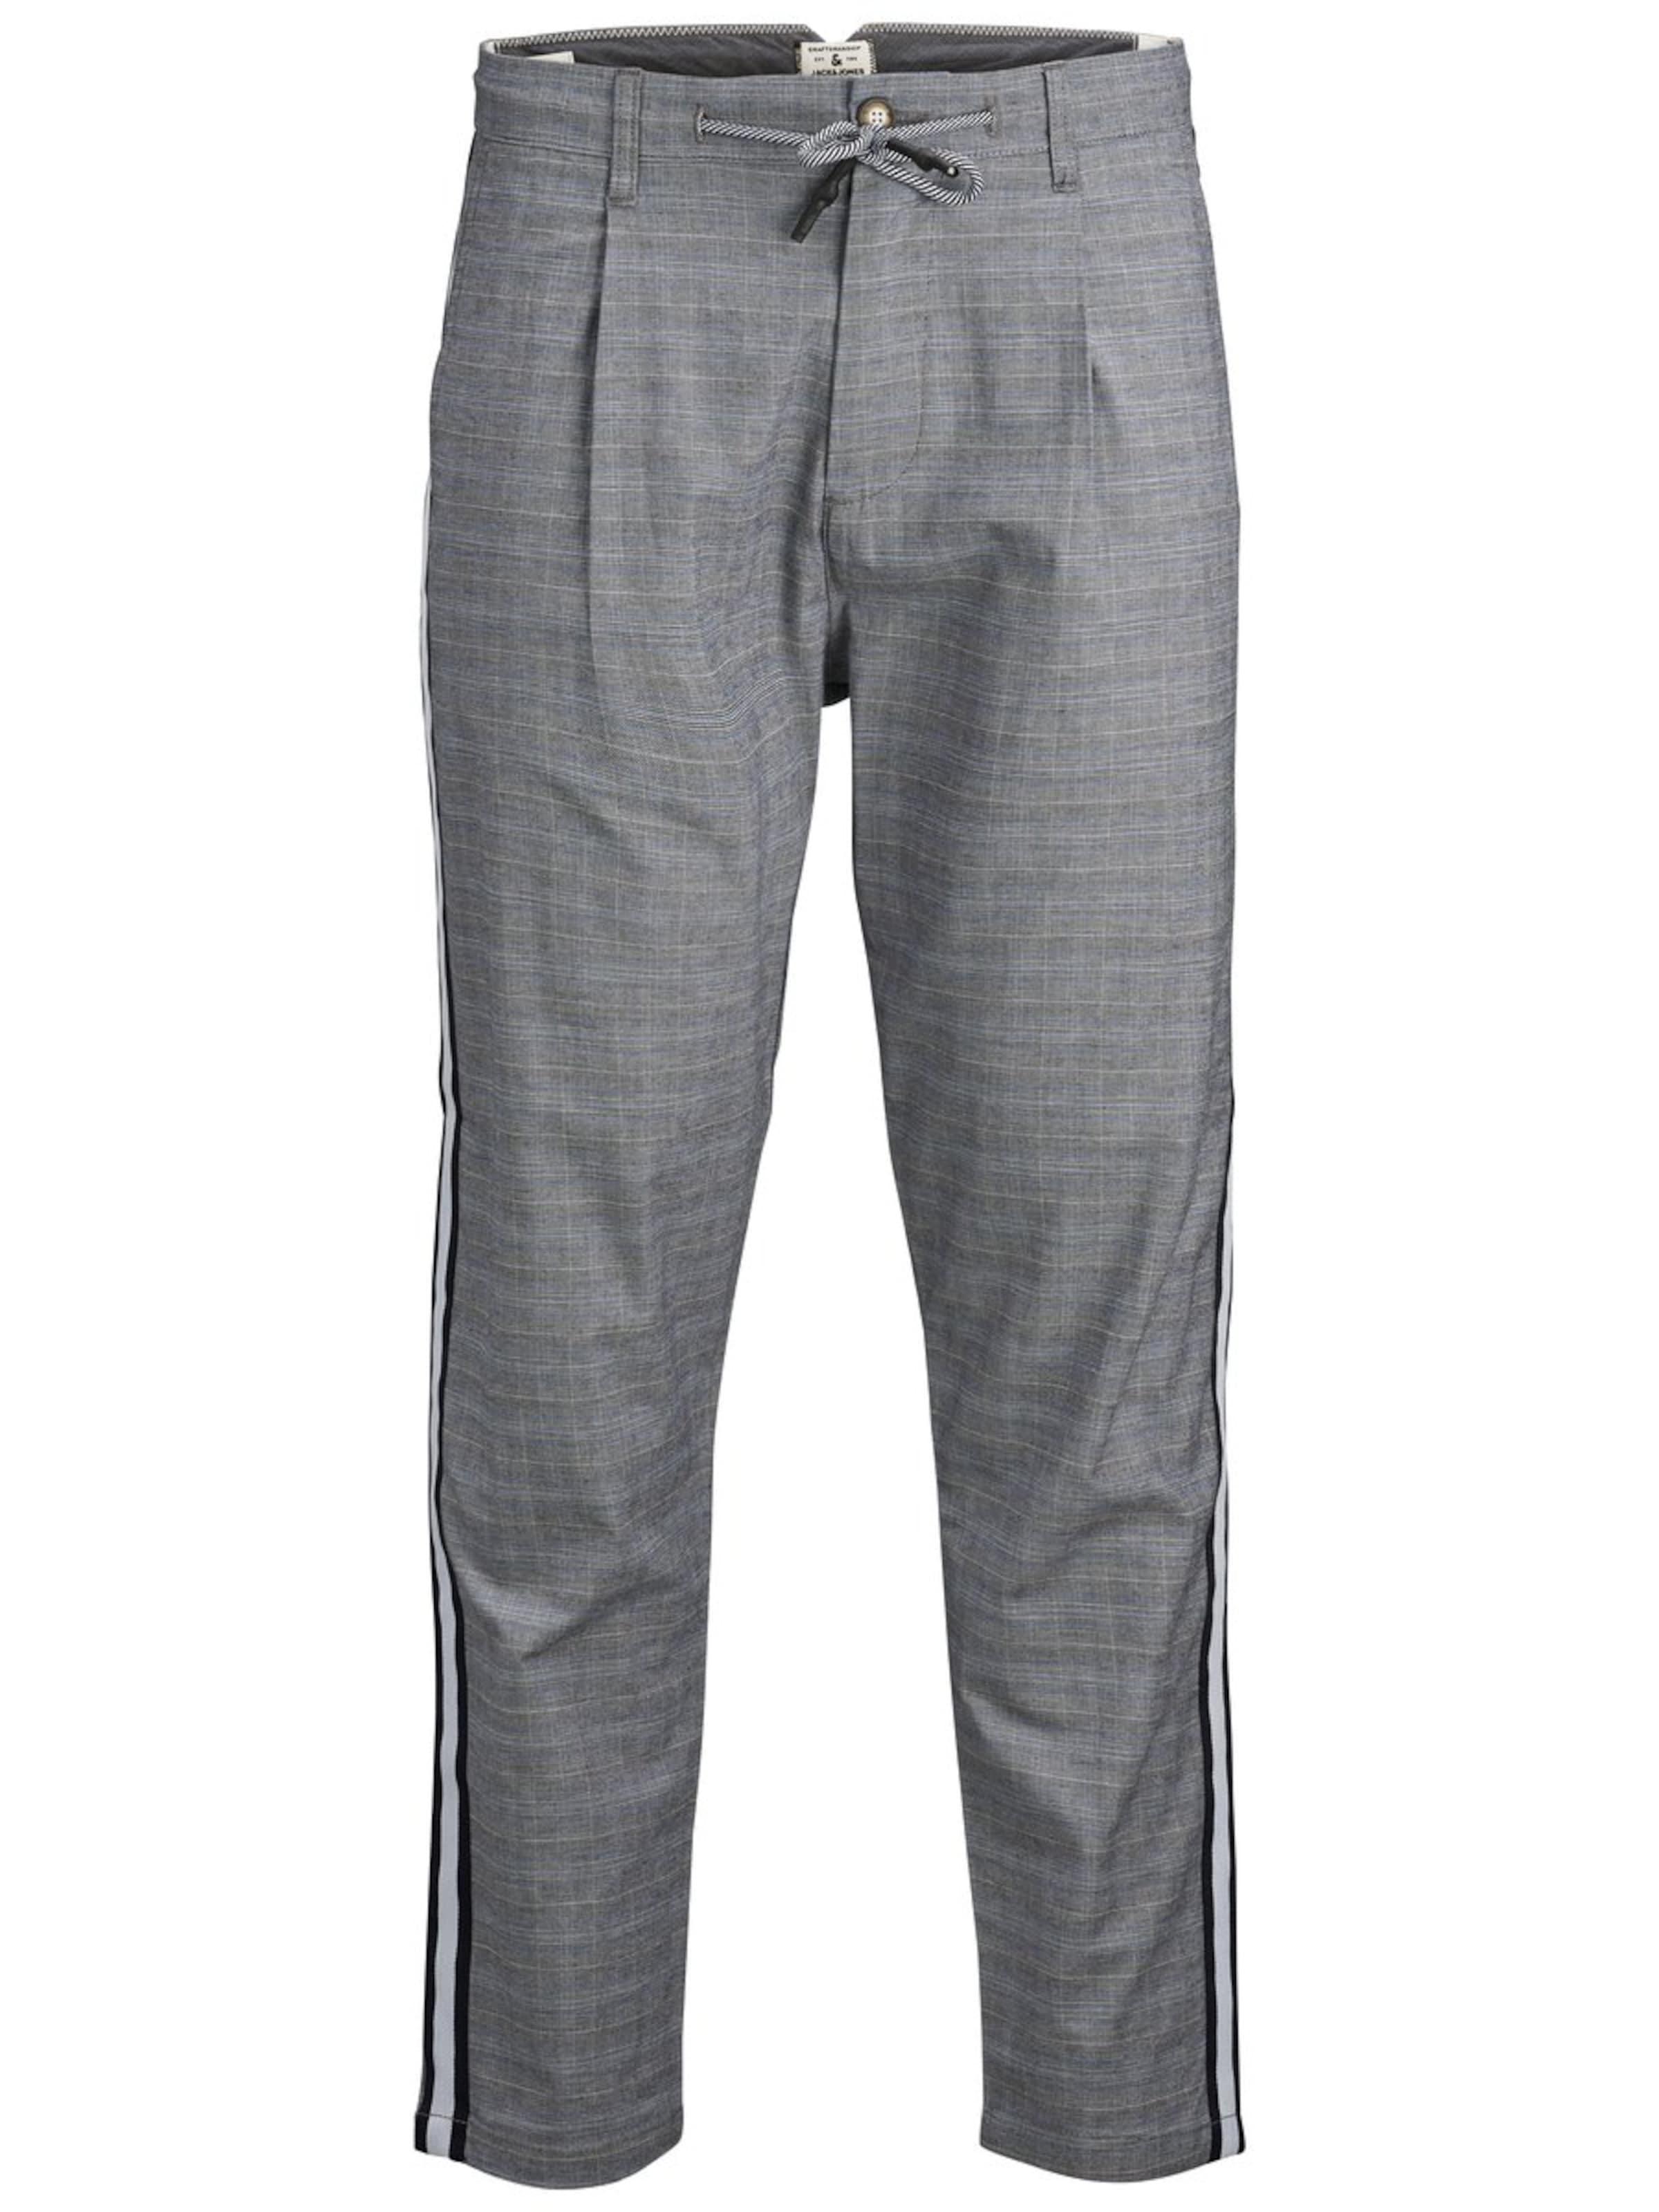 Jones Chino En Jackamp; GrisClair Pantalon WdxroBEQCe